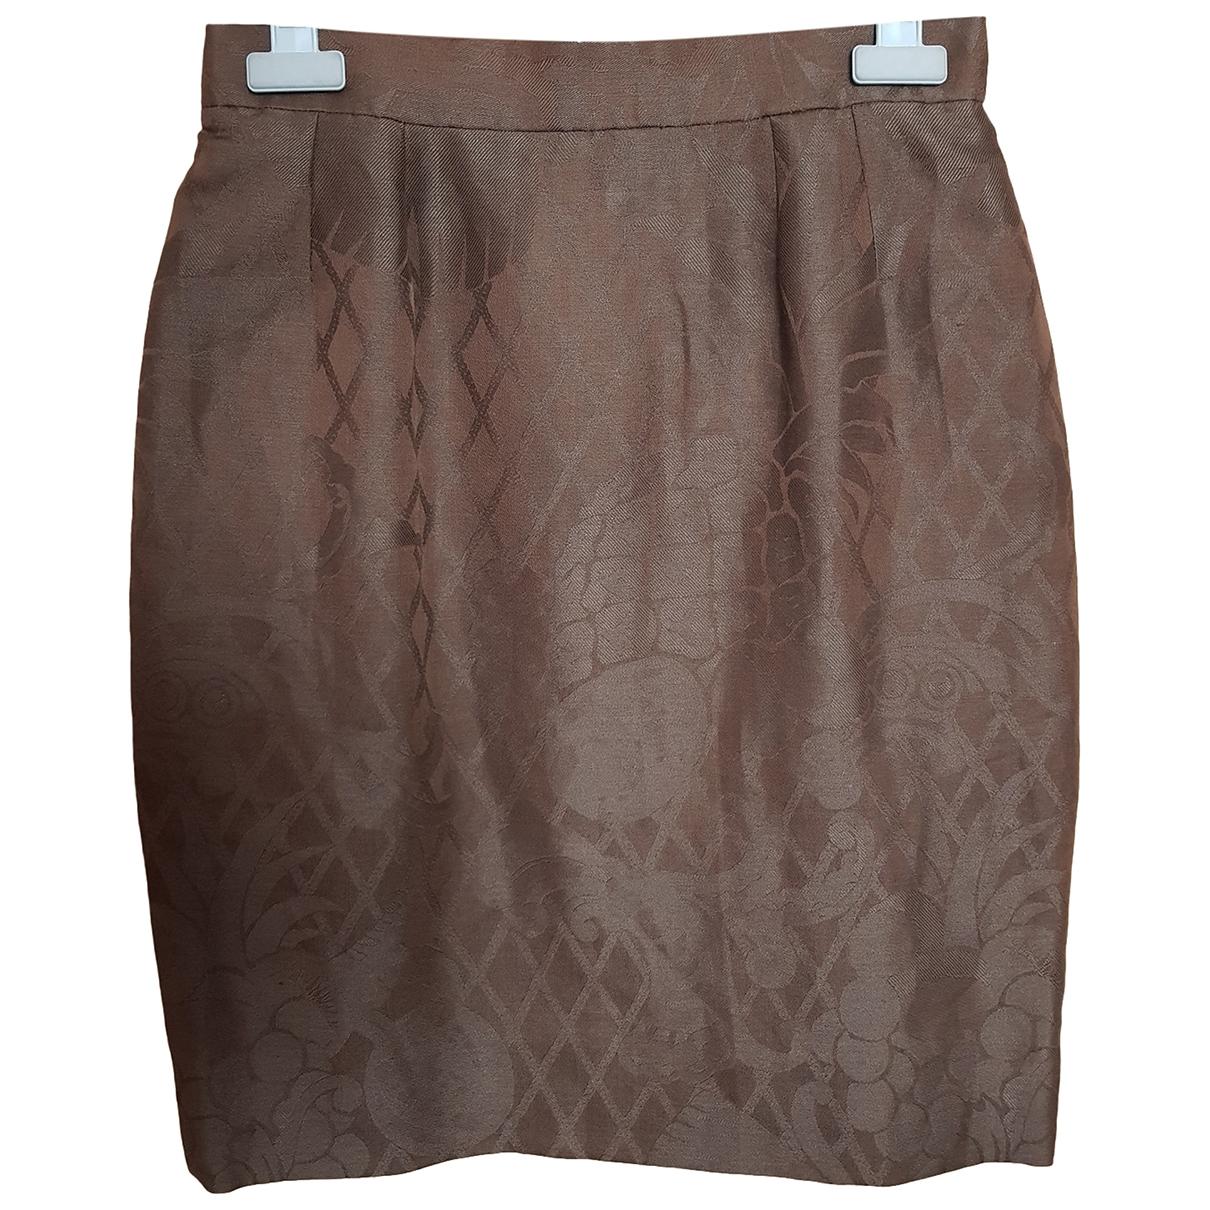 Dior \N Brown Cotton skirt for Women 40 FR